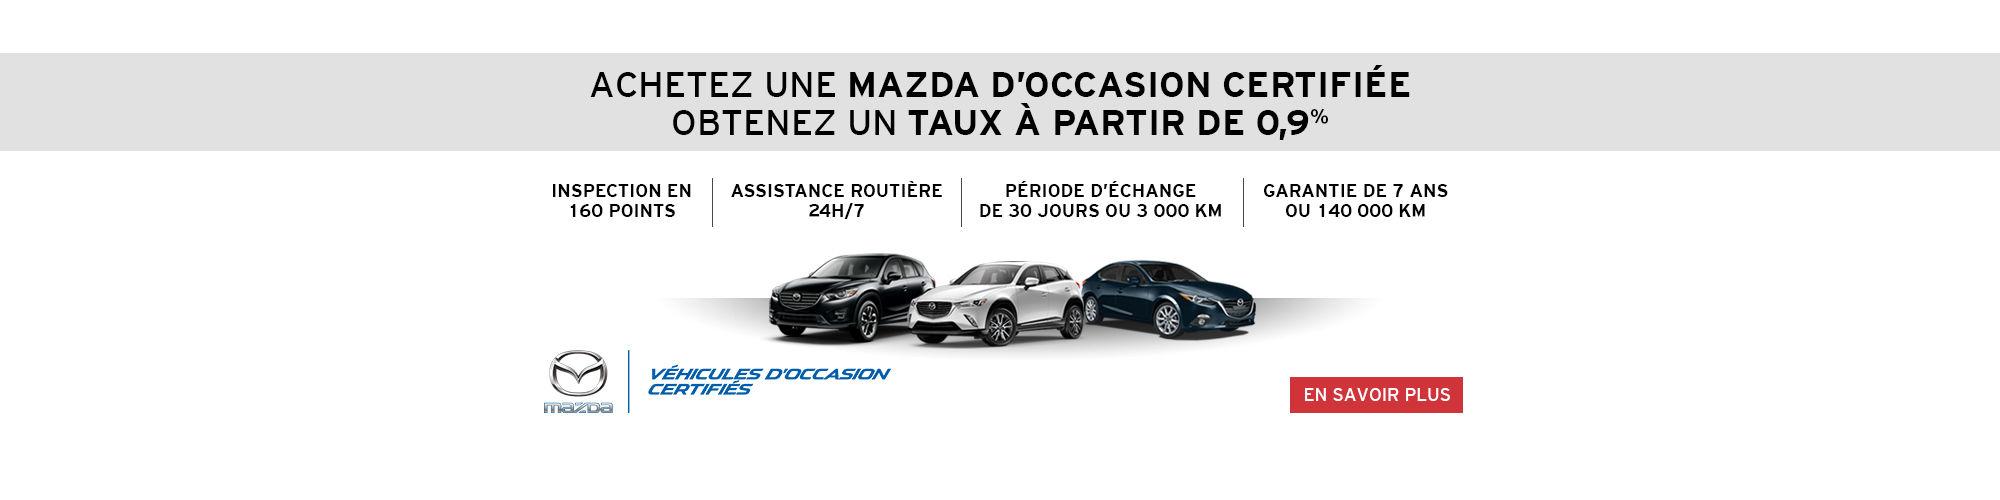 Mazda Occasion Certifié